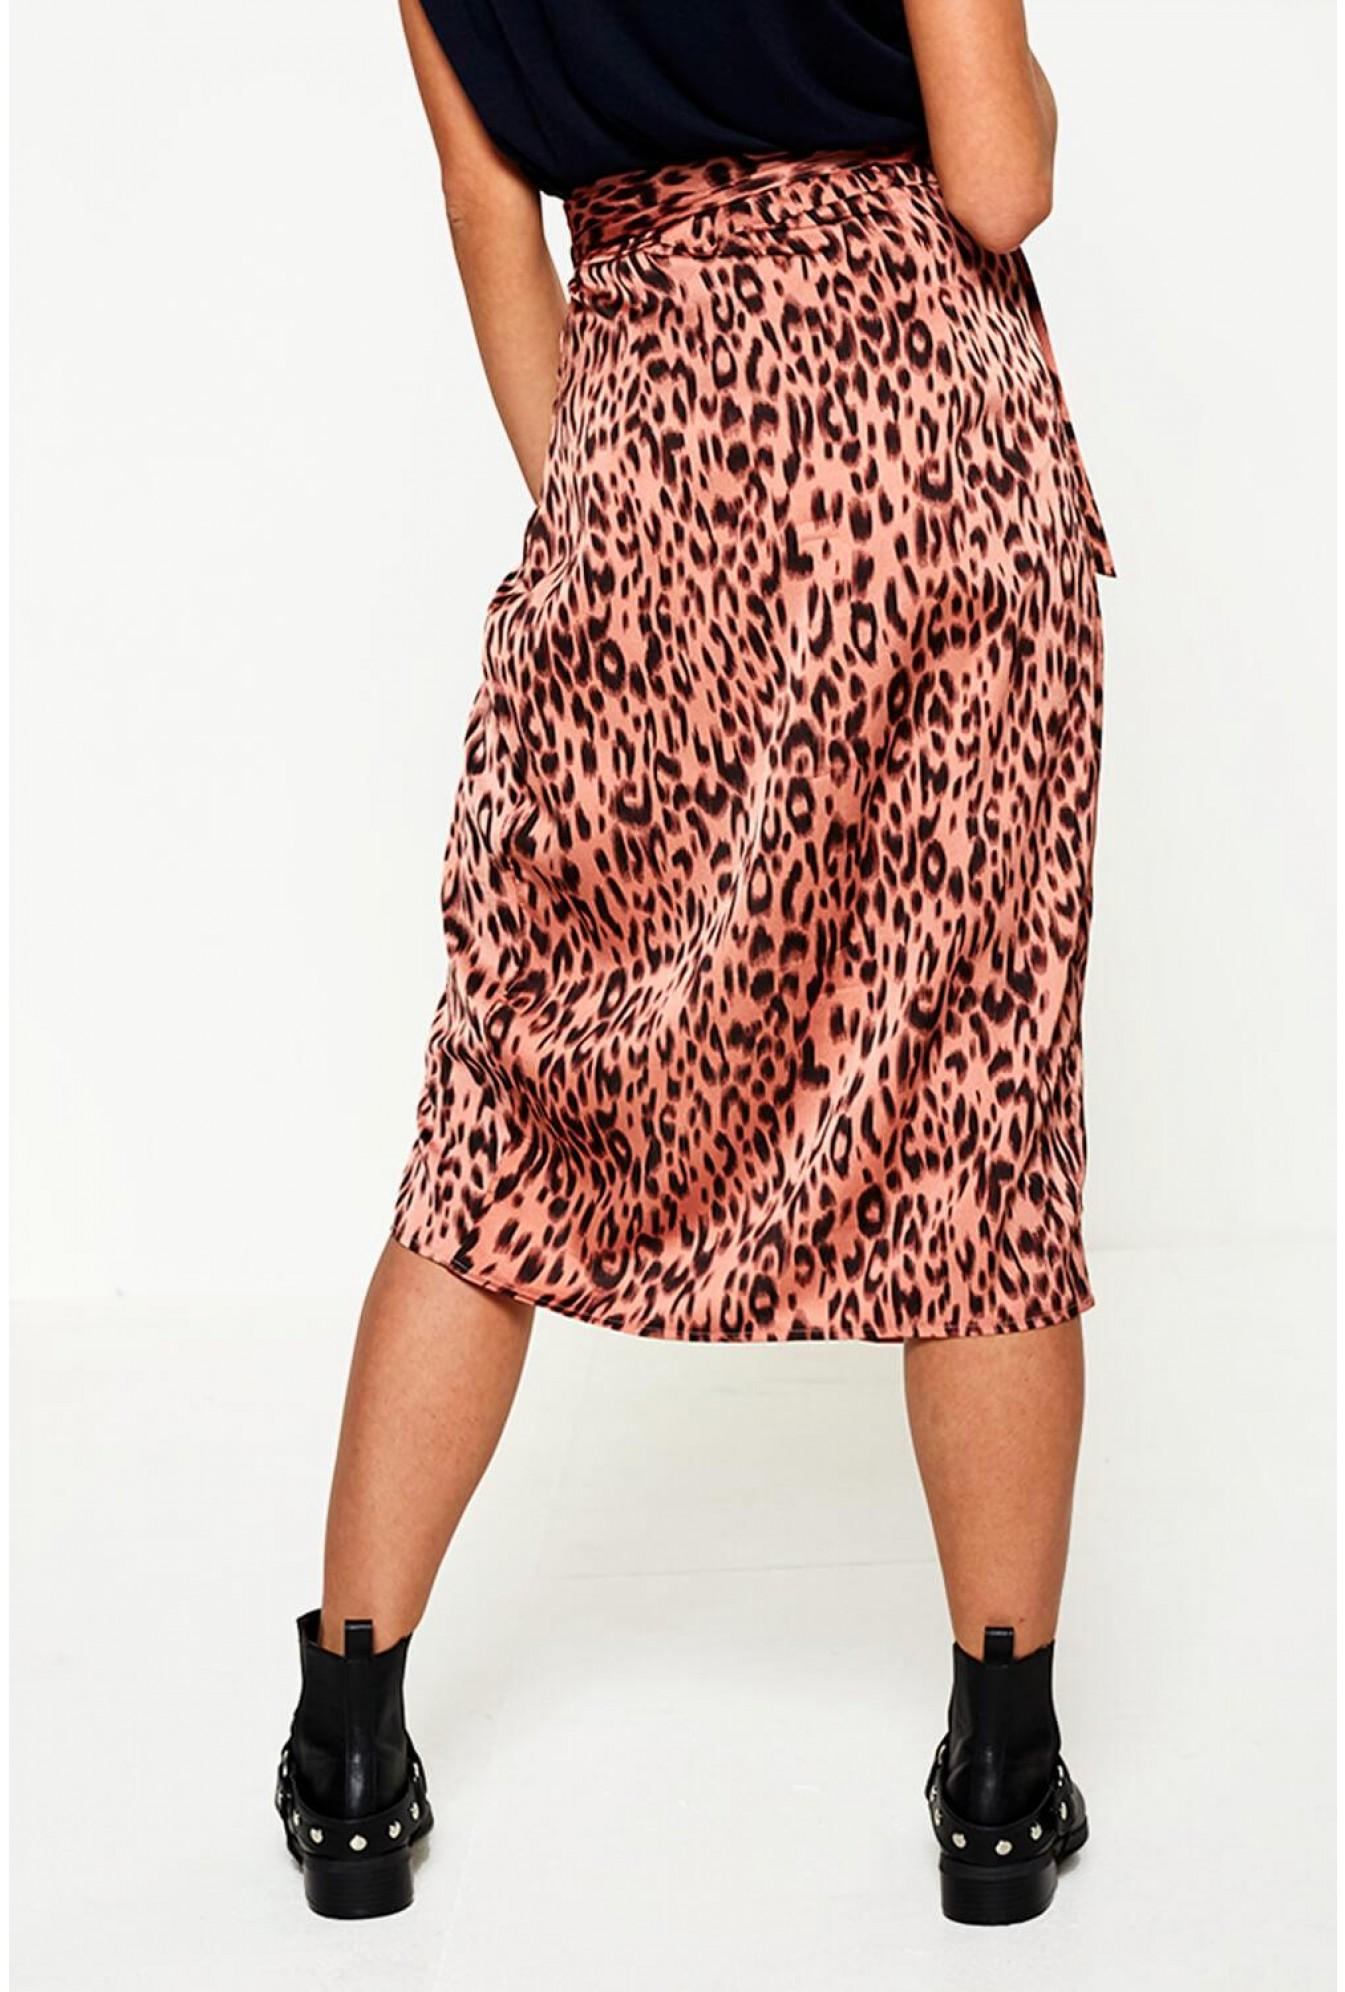 827e82bf9c10 Pixie Daisy Rica Animal Print Midi Skirt in Blush